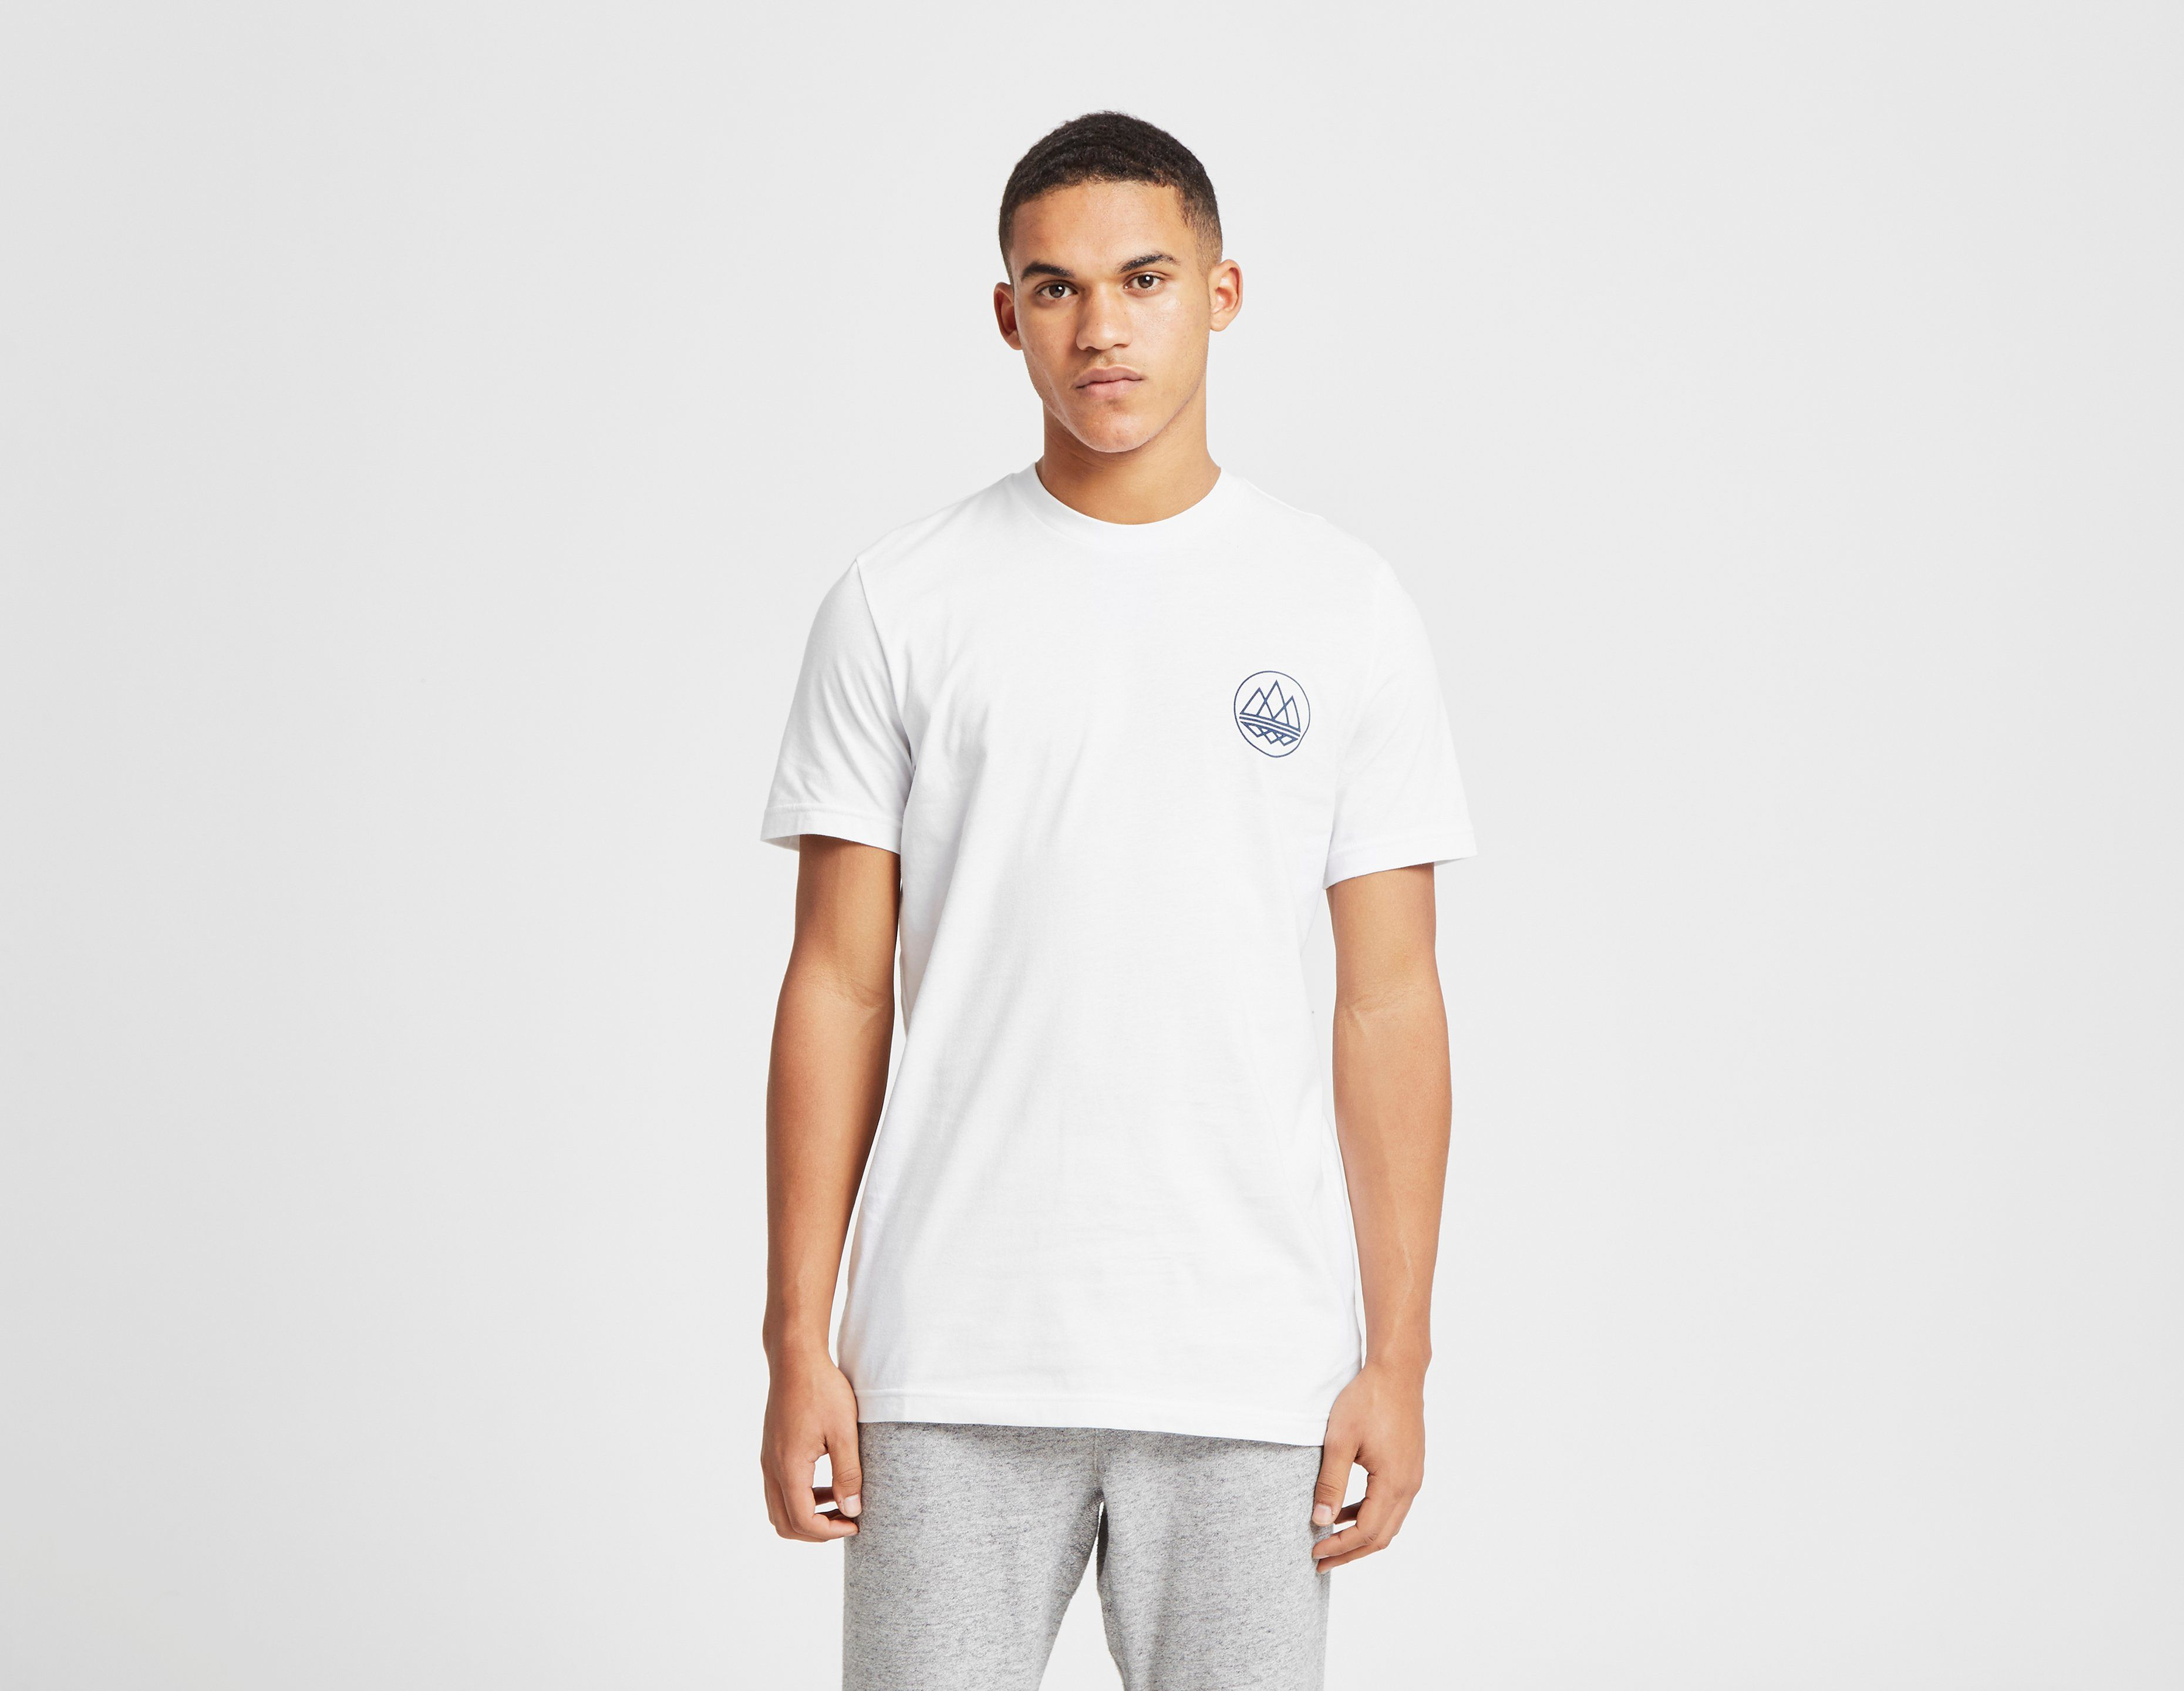 adidas SPEZIAL x Union SS T-Shirt